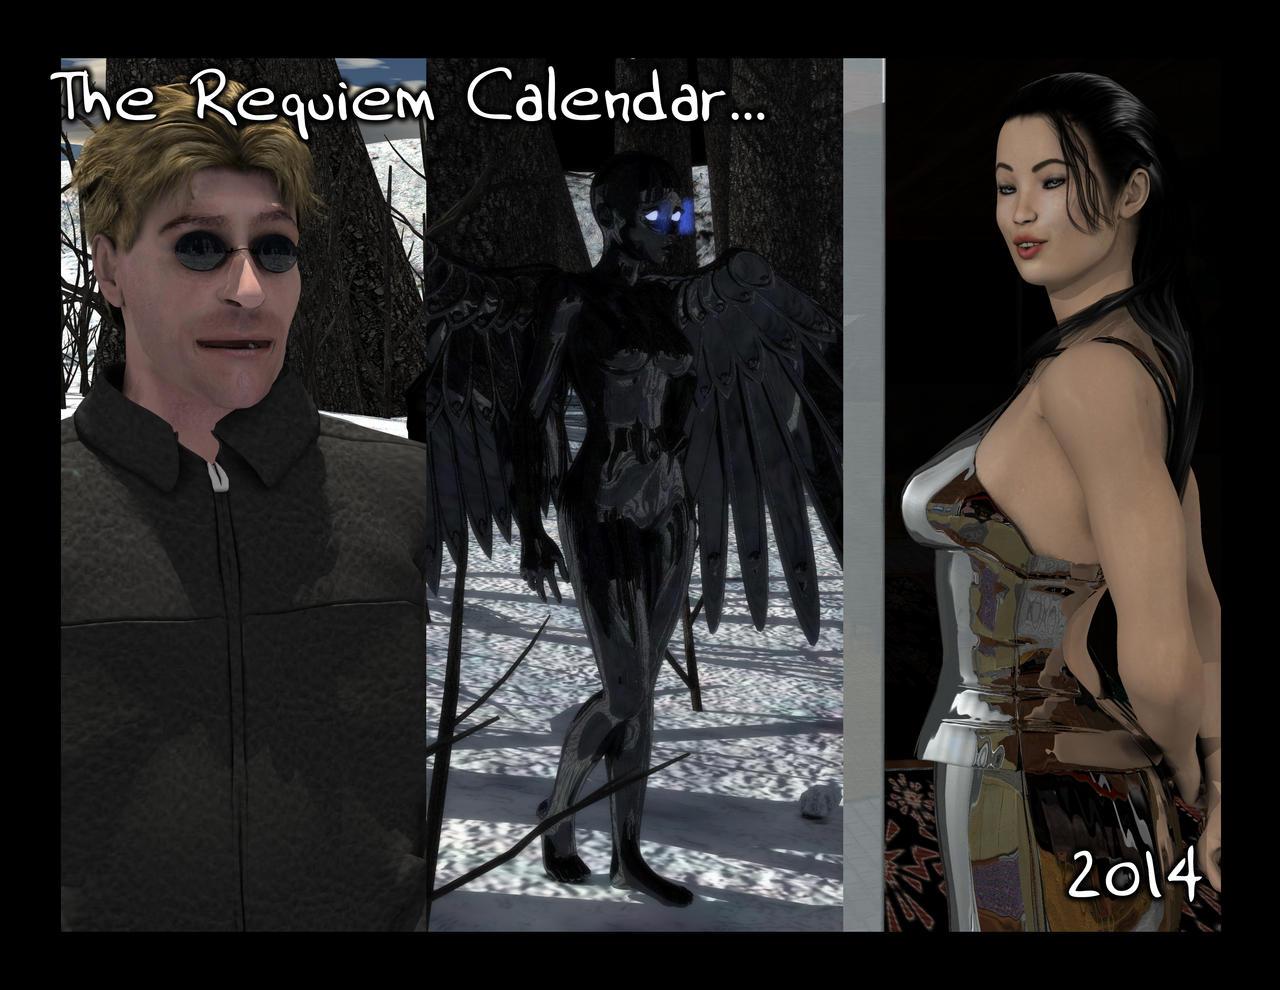 Requiem Calendar, 2014 by Requiemwebcomic